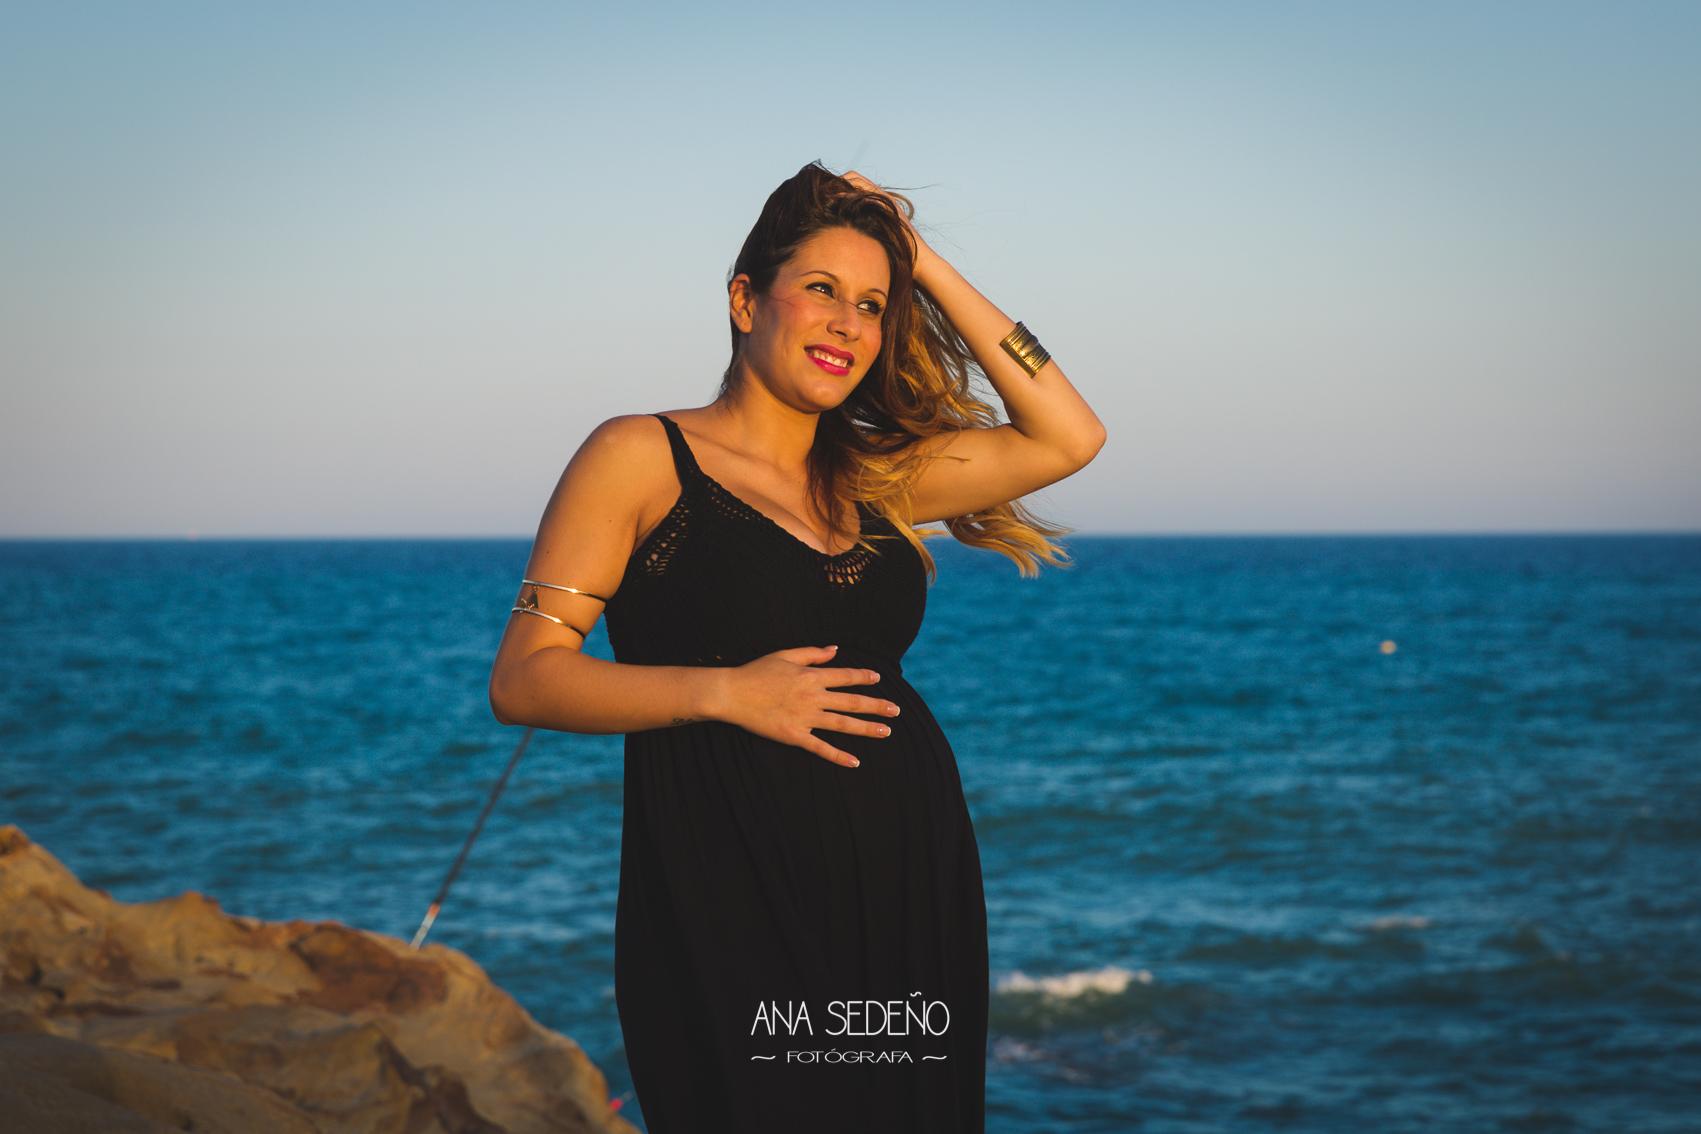 Ana Sedeño Fotografa.-Silvia-0434